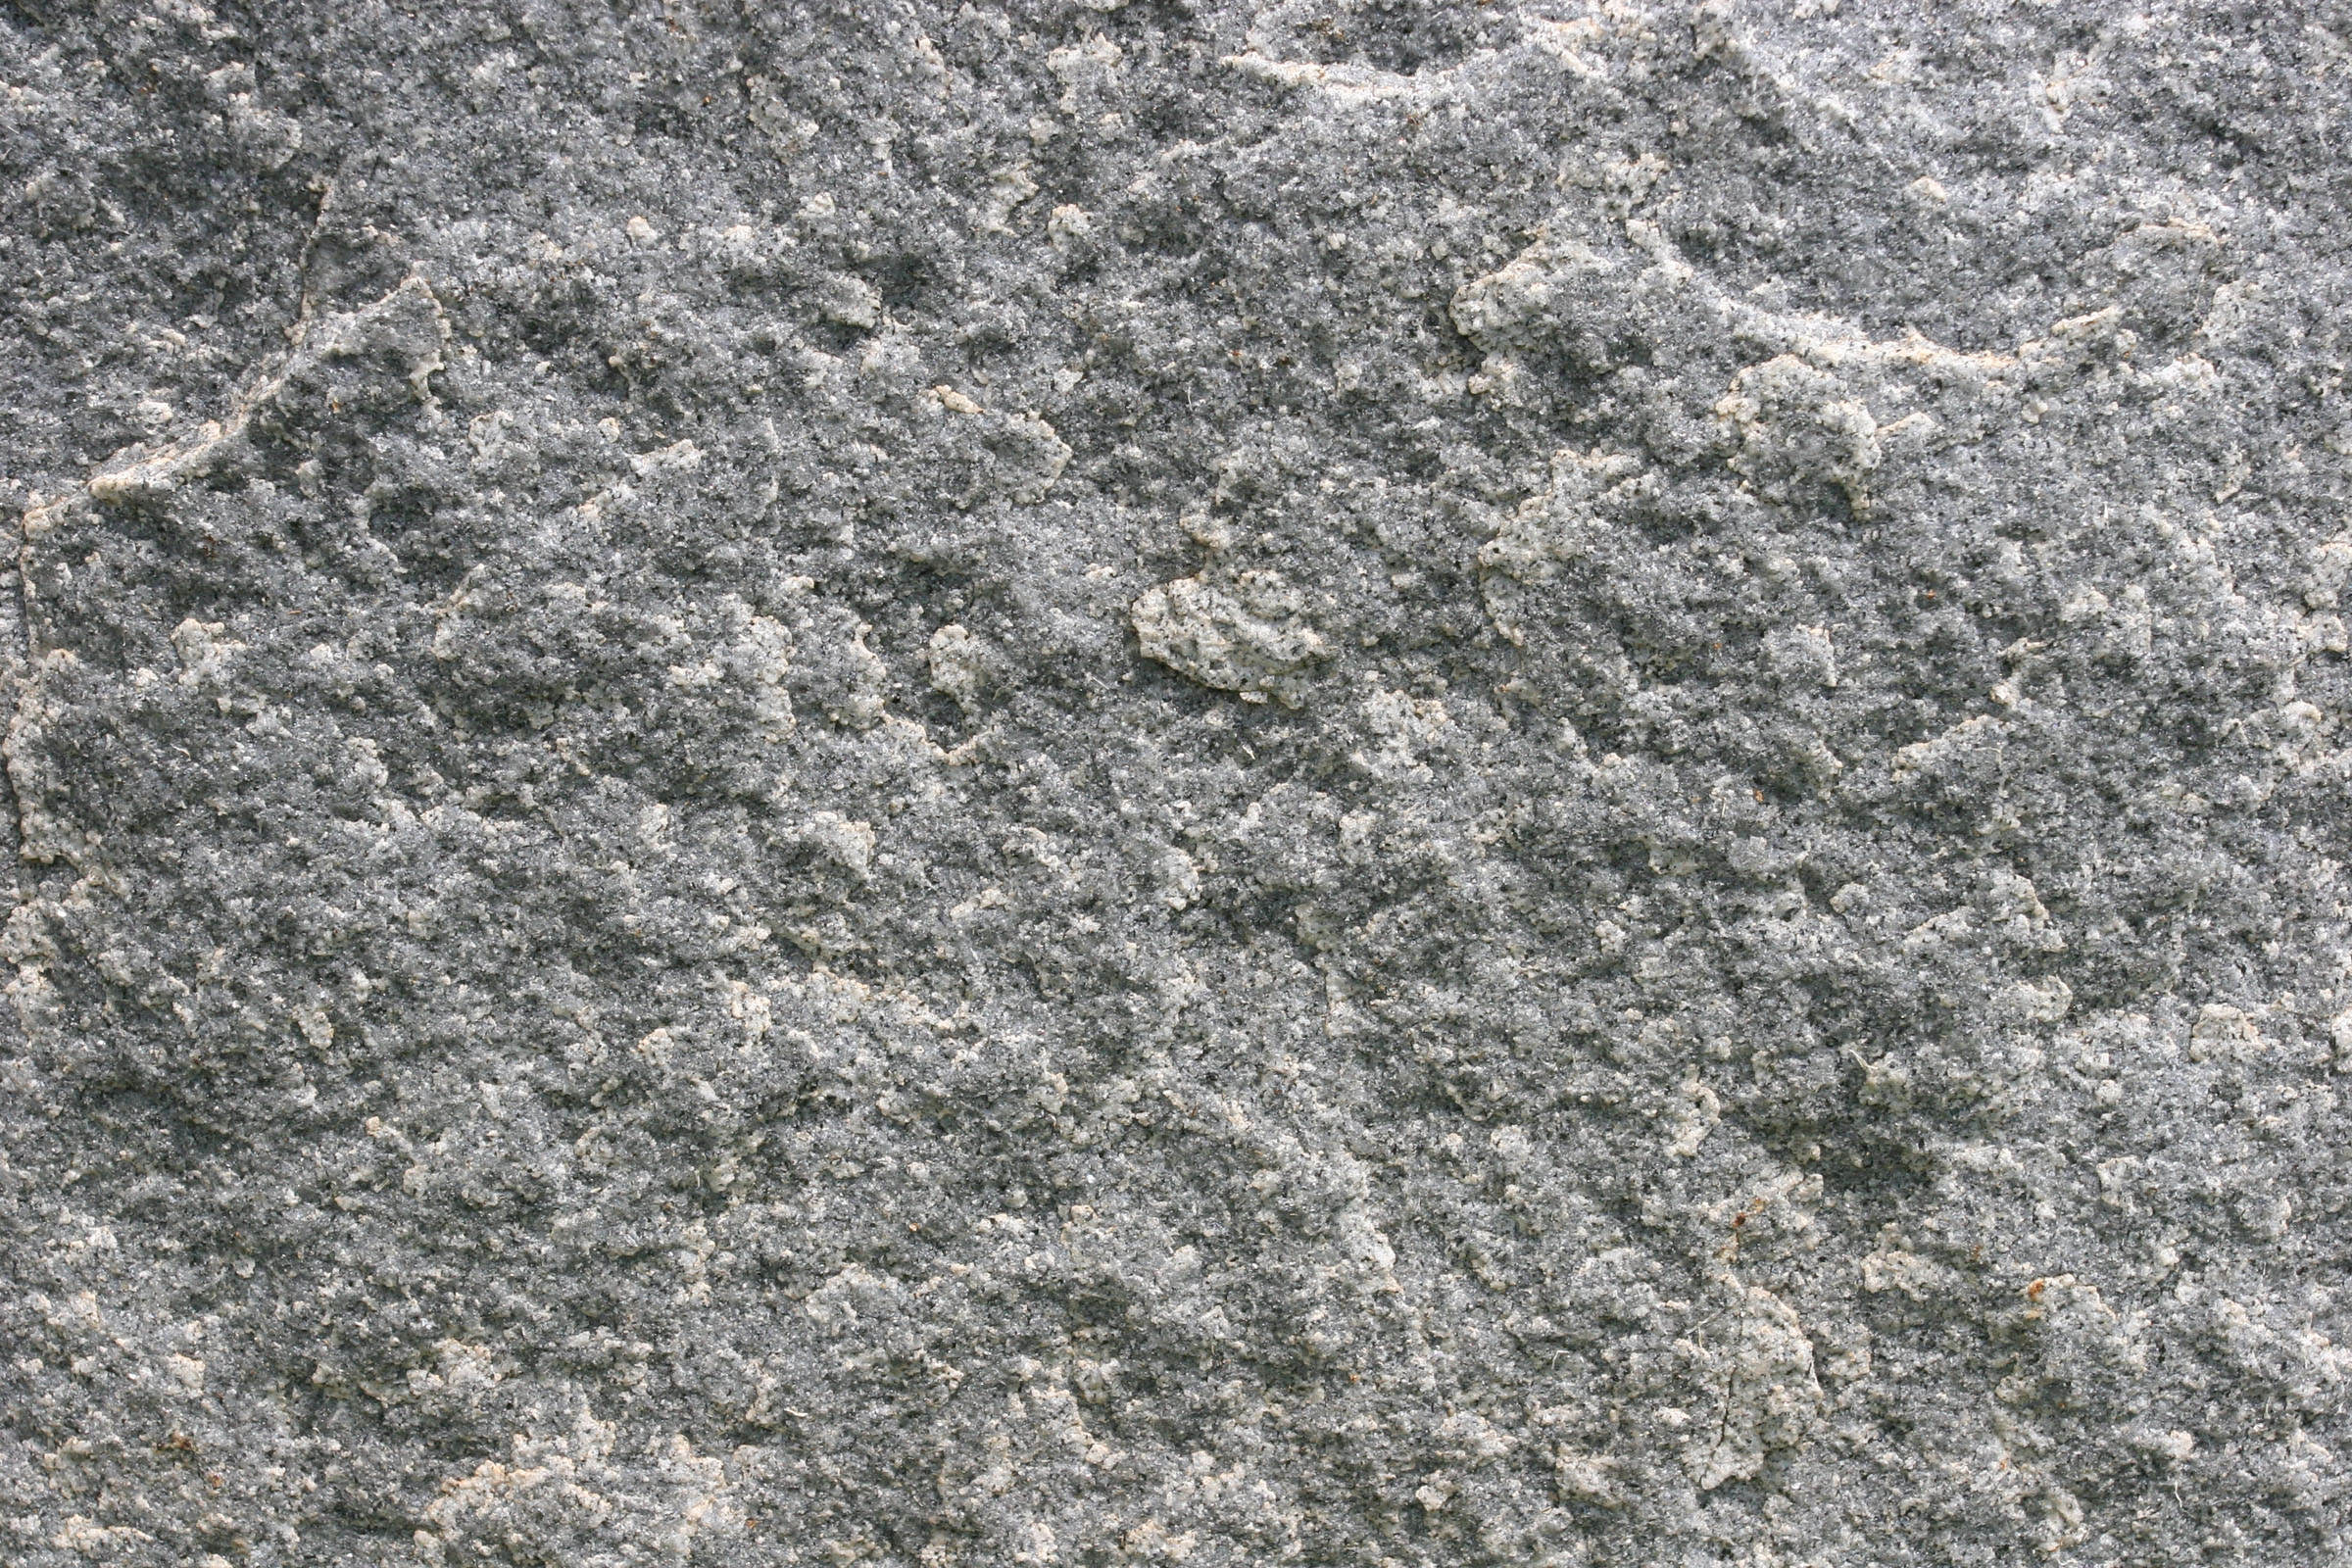 Natural Stone Floor Texture